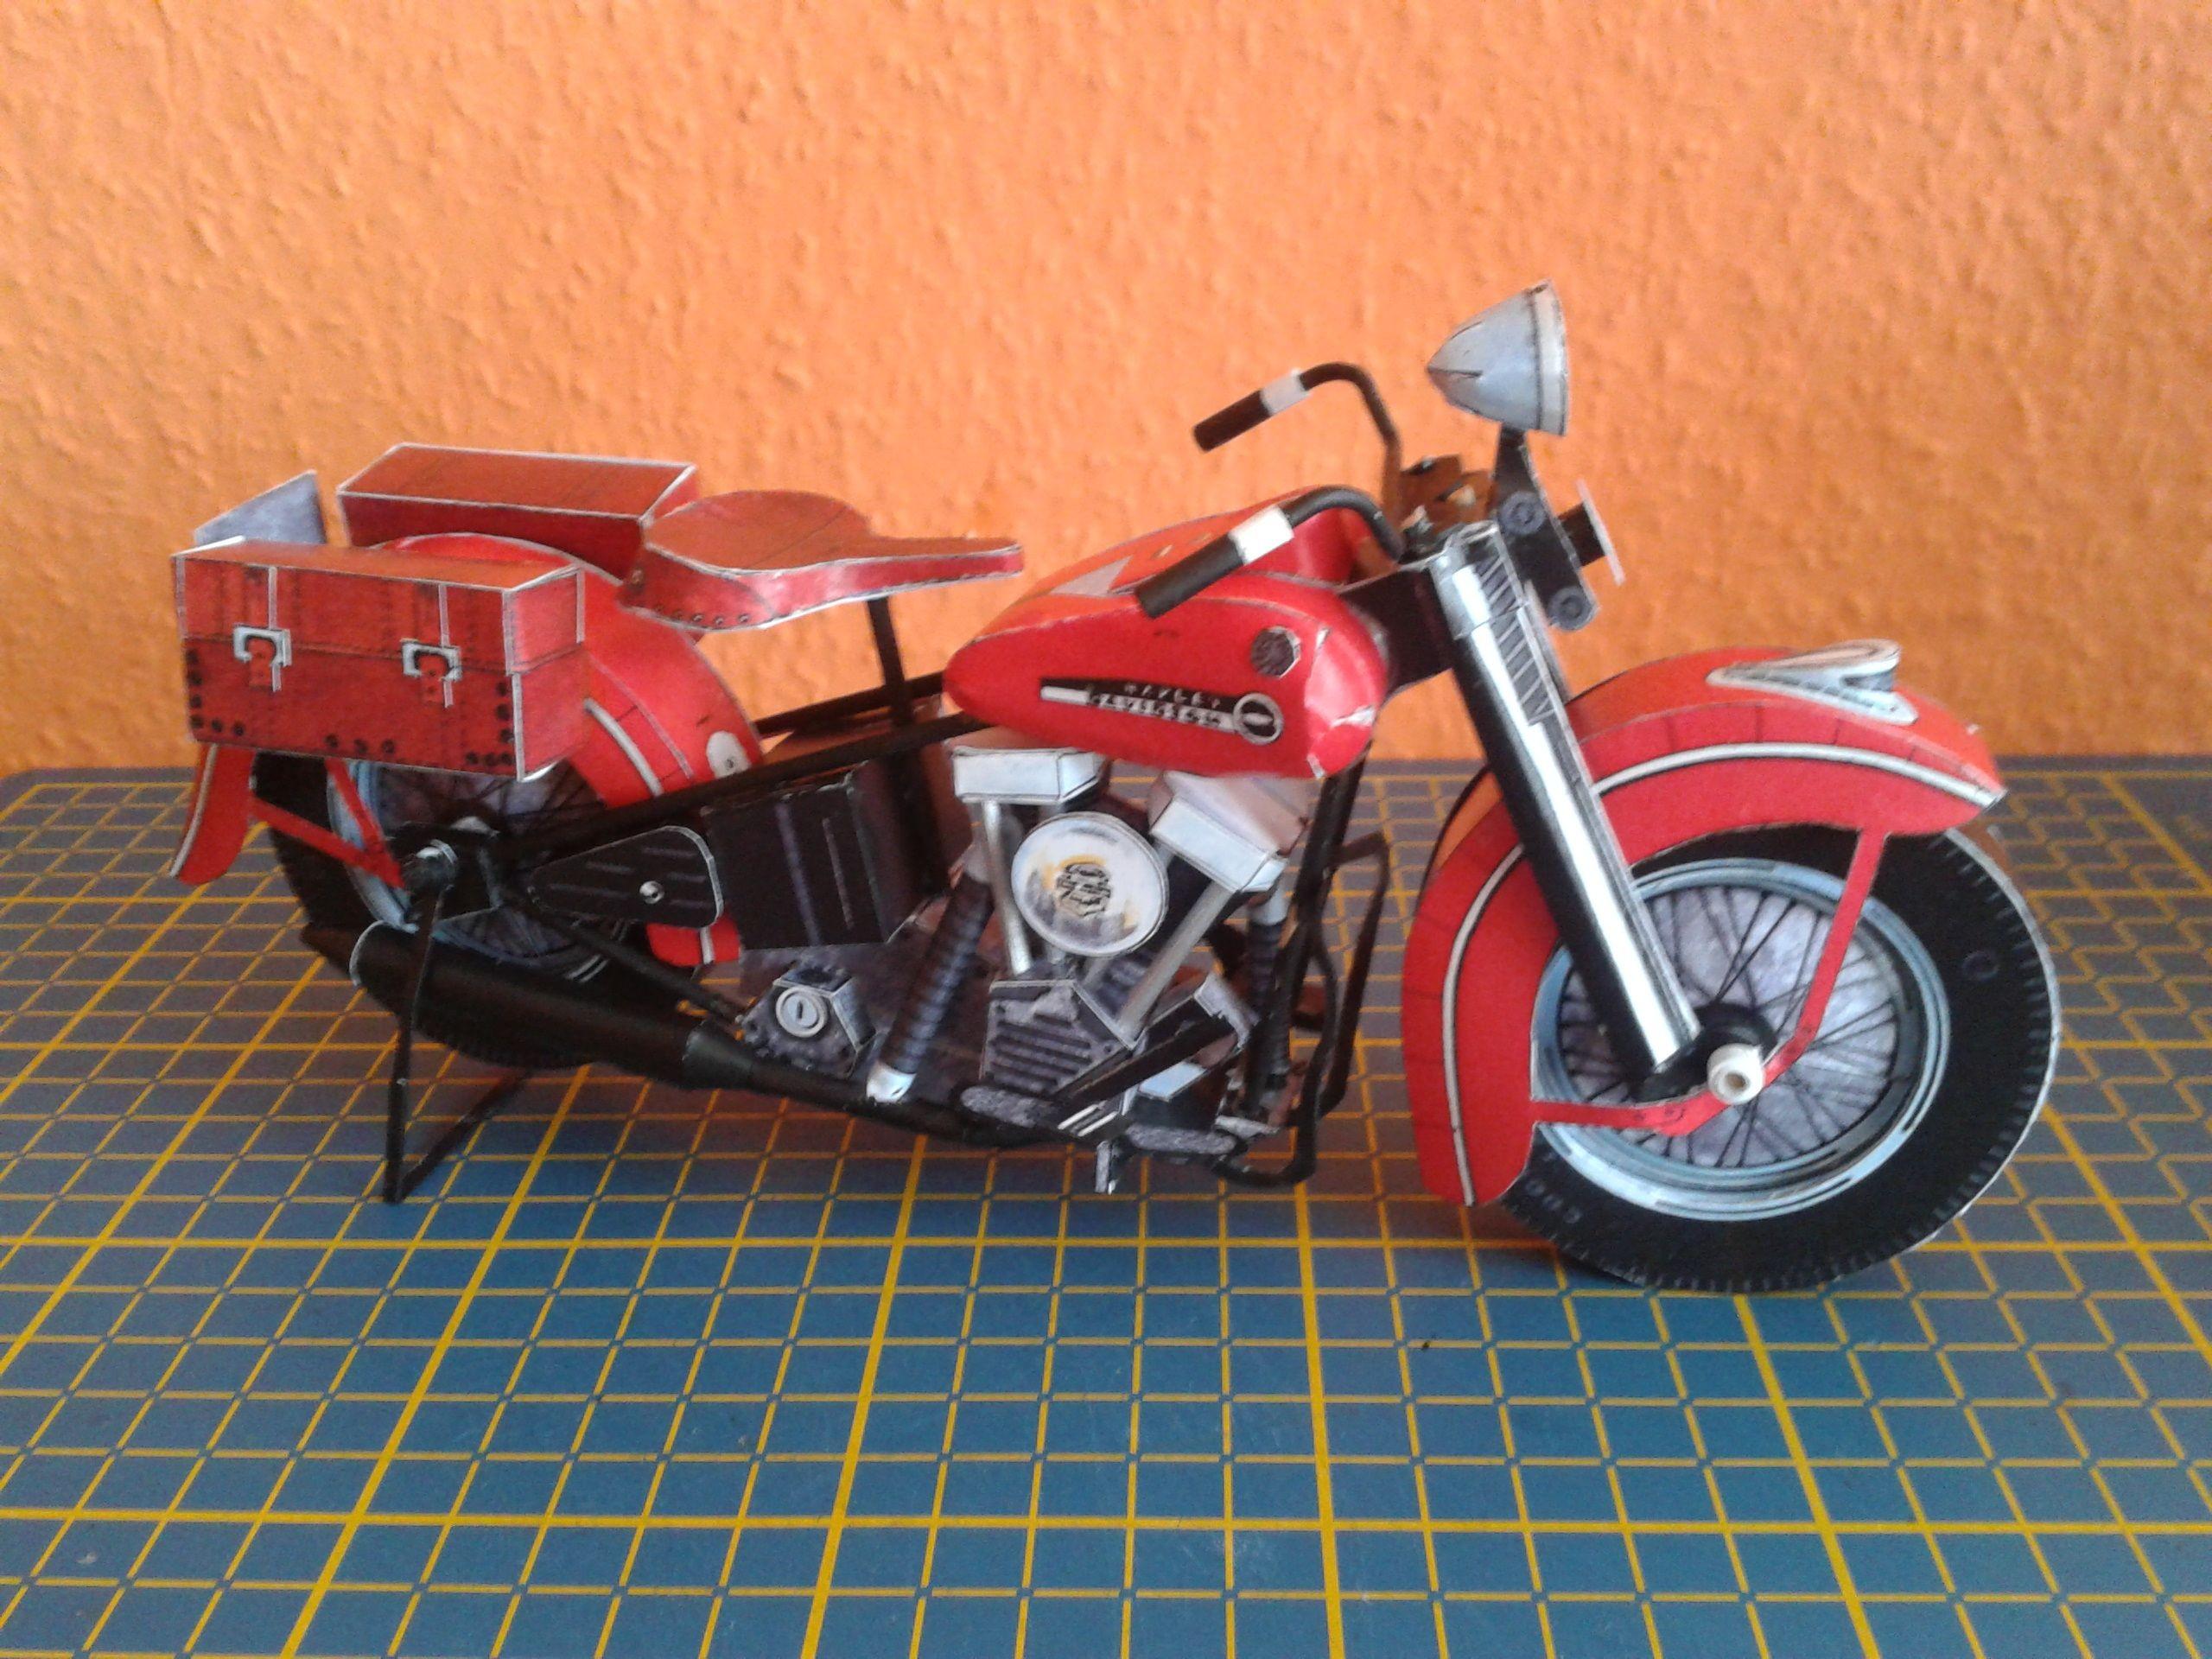 Yamaha Papercraft Yamaha Papercraft Yamaha Yz450f 450 °f = 232 °c Motorcycle Free